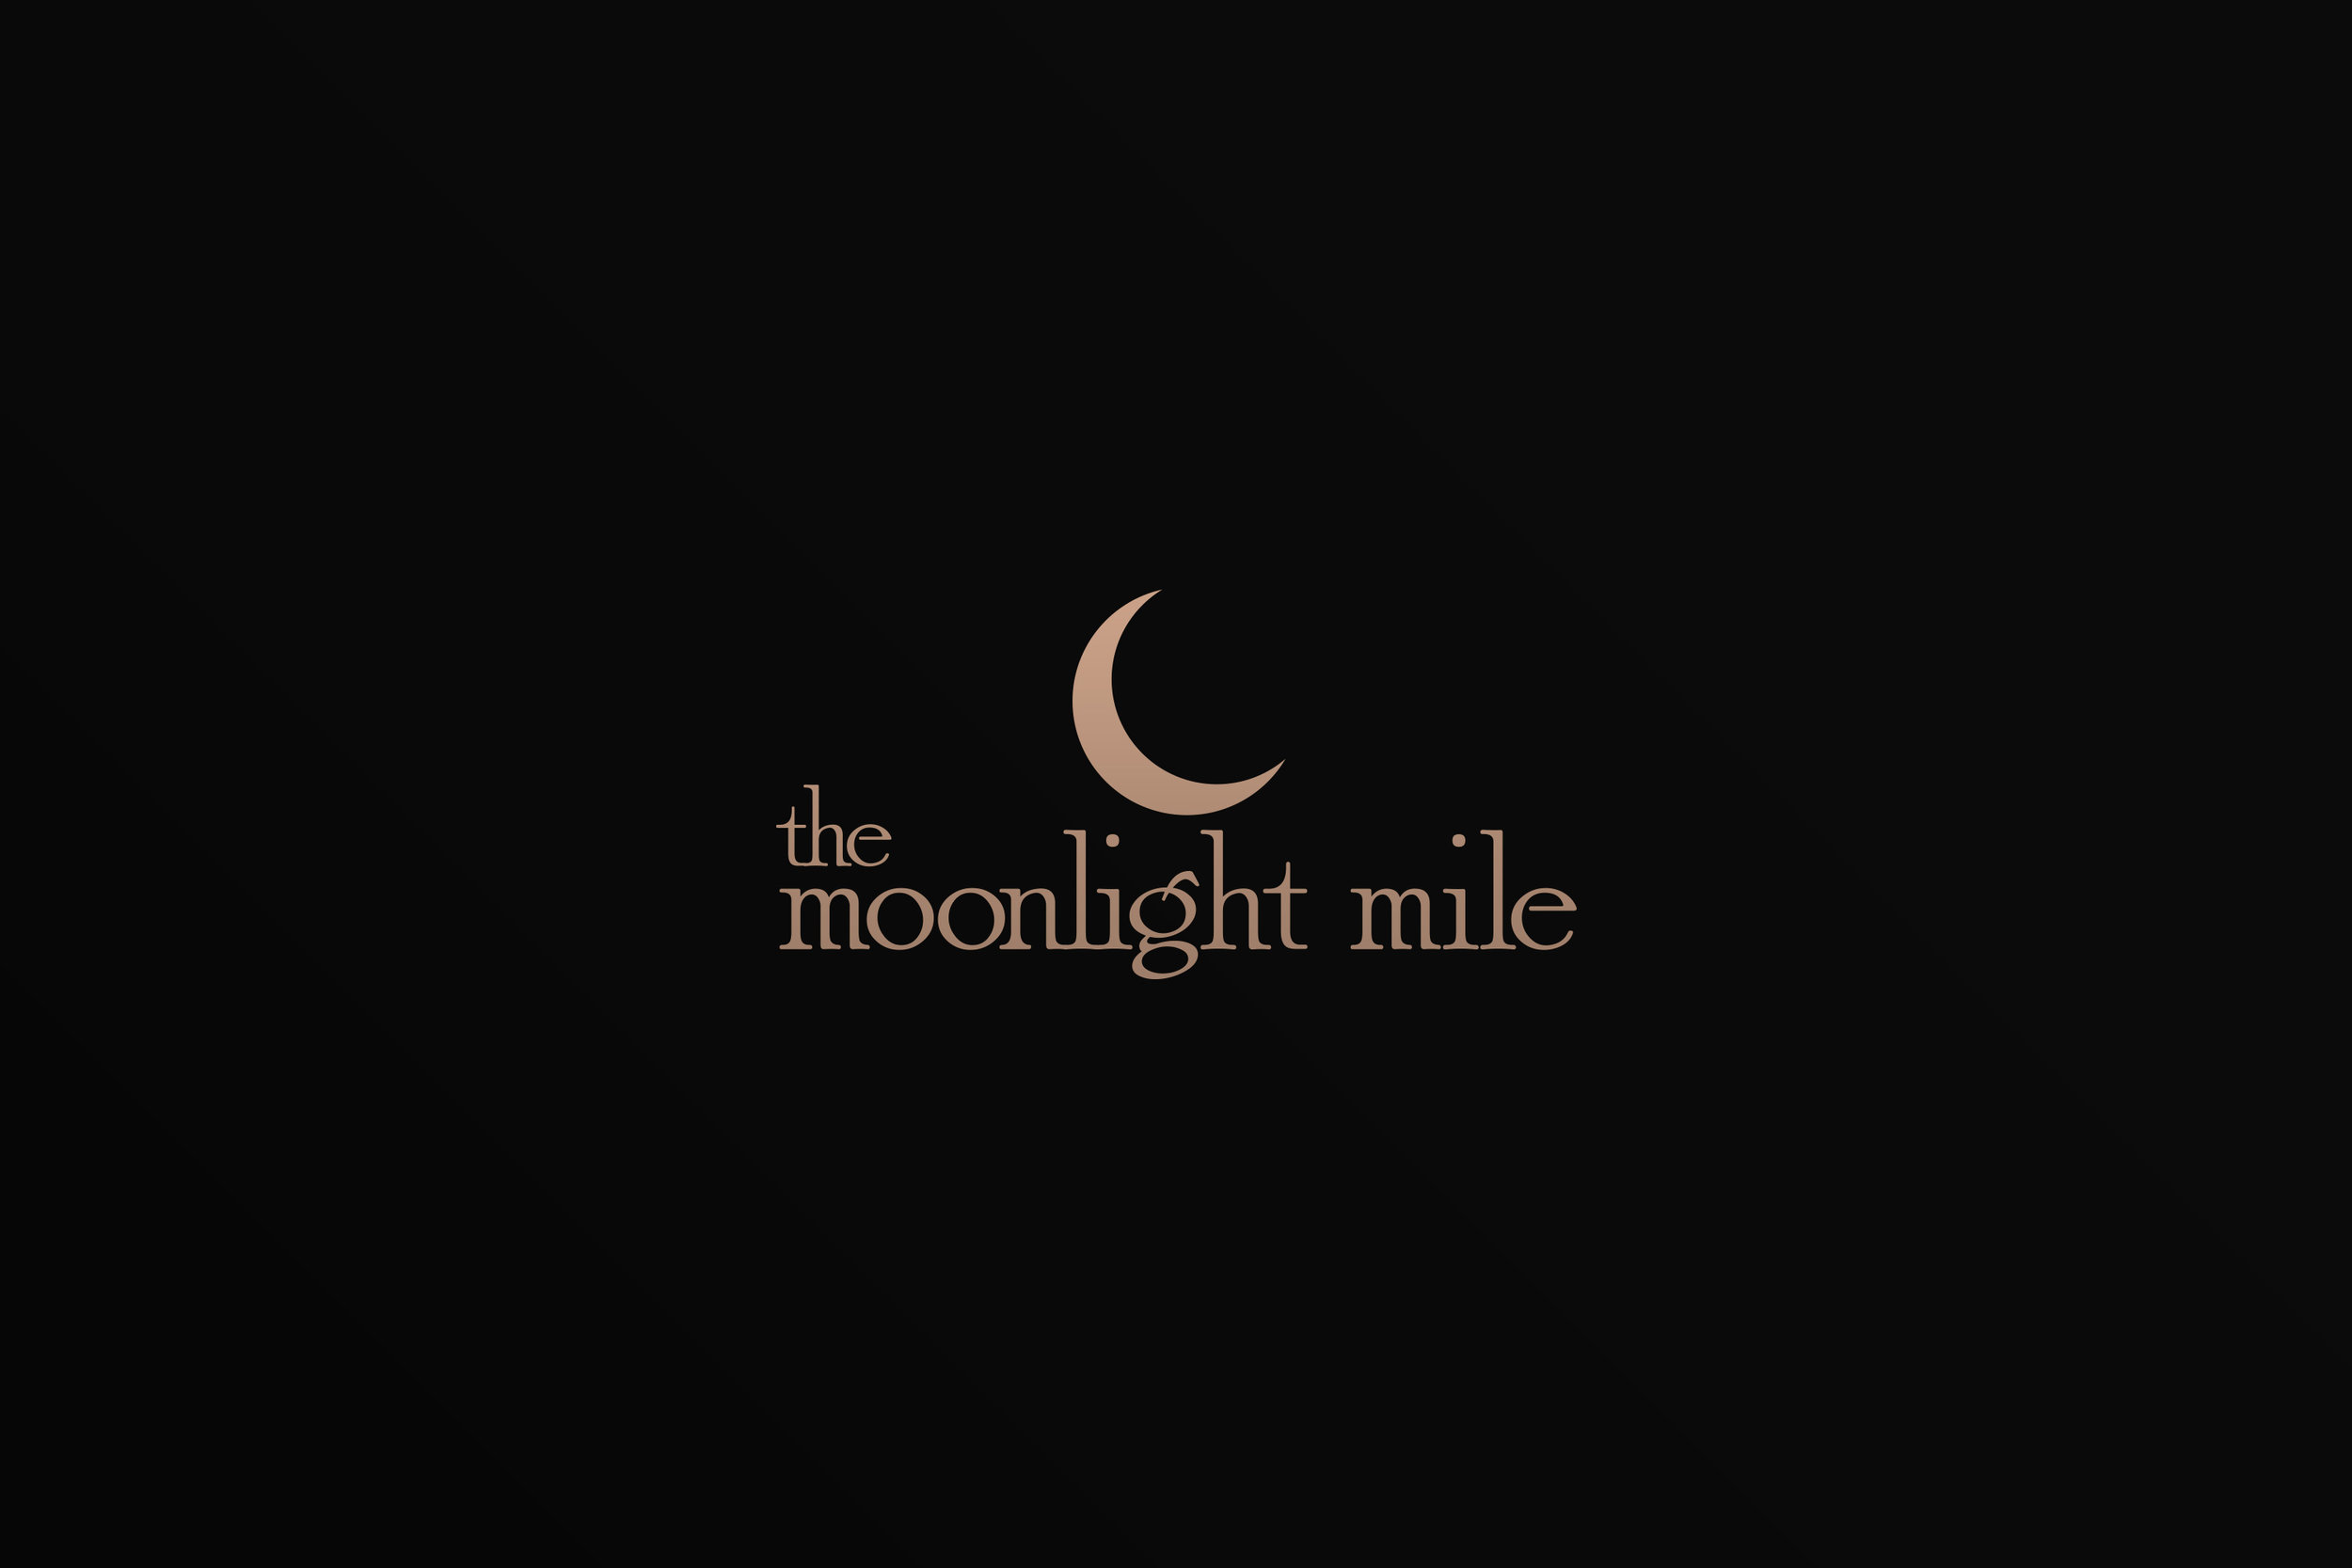 Studio_BLOQ_The_Moonlight_Mile_Greenpoint_Logo.jpg